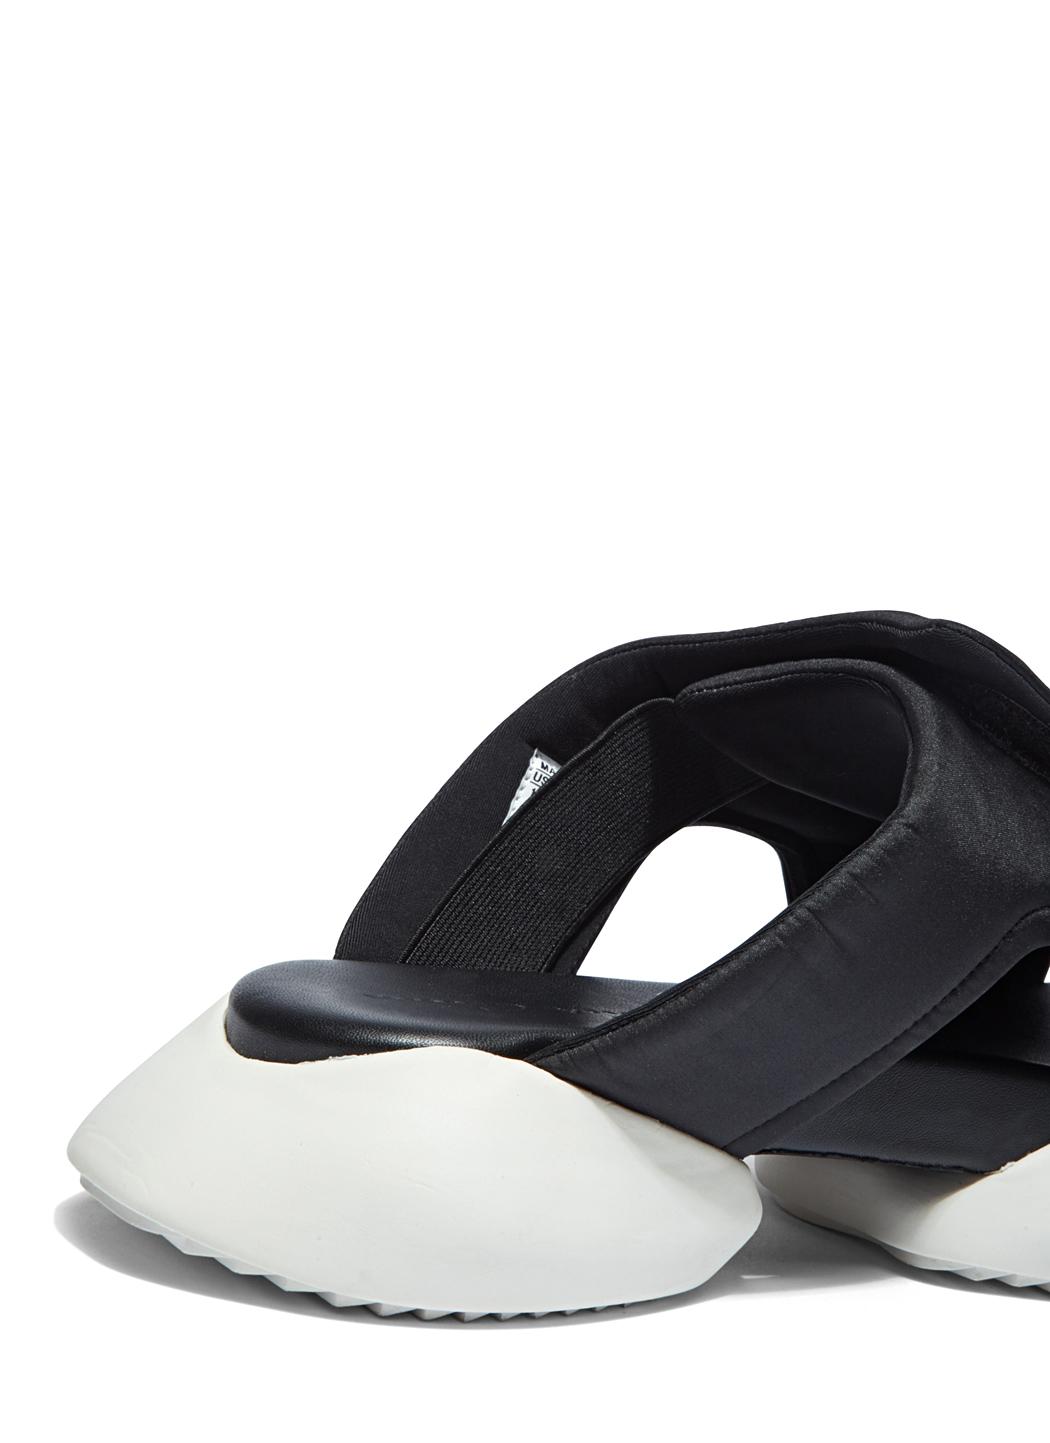 Lyst Rick Owens X Adidas Women S Velcro Strap Ro Clog